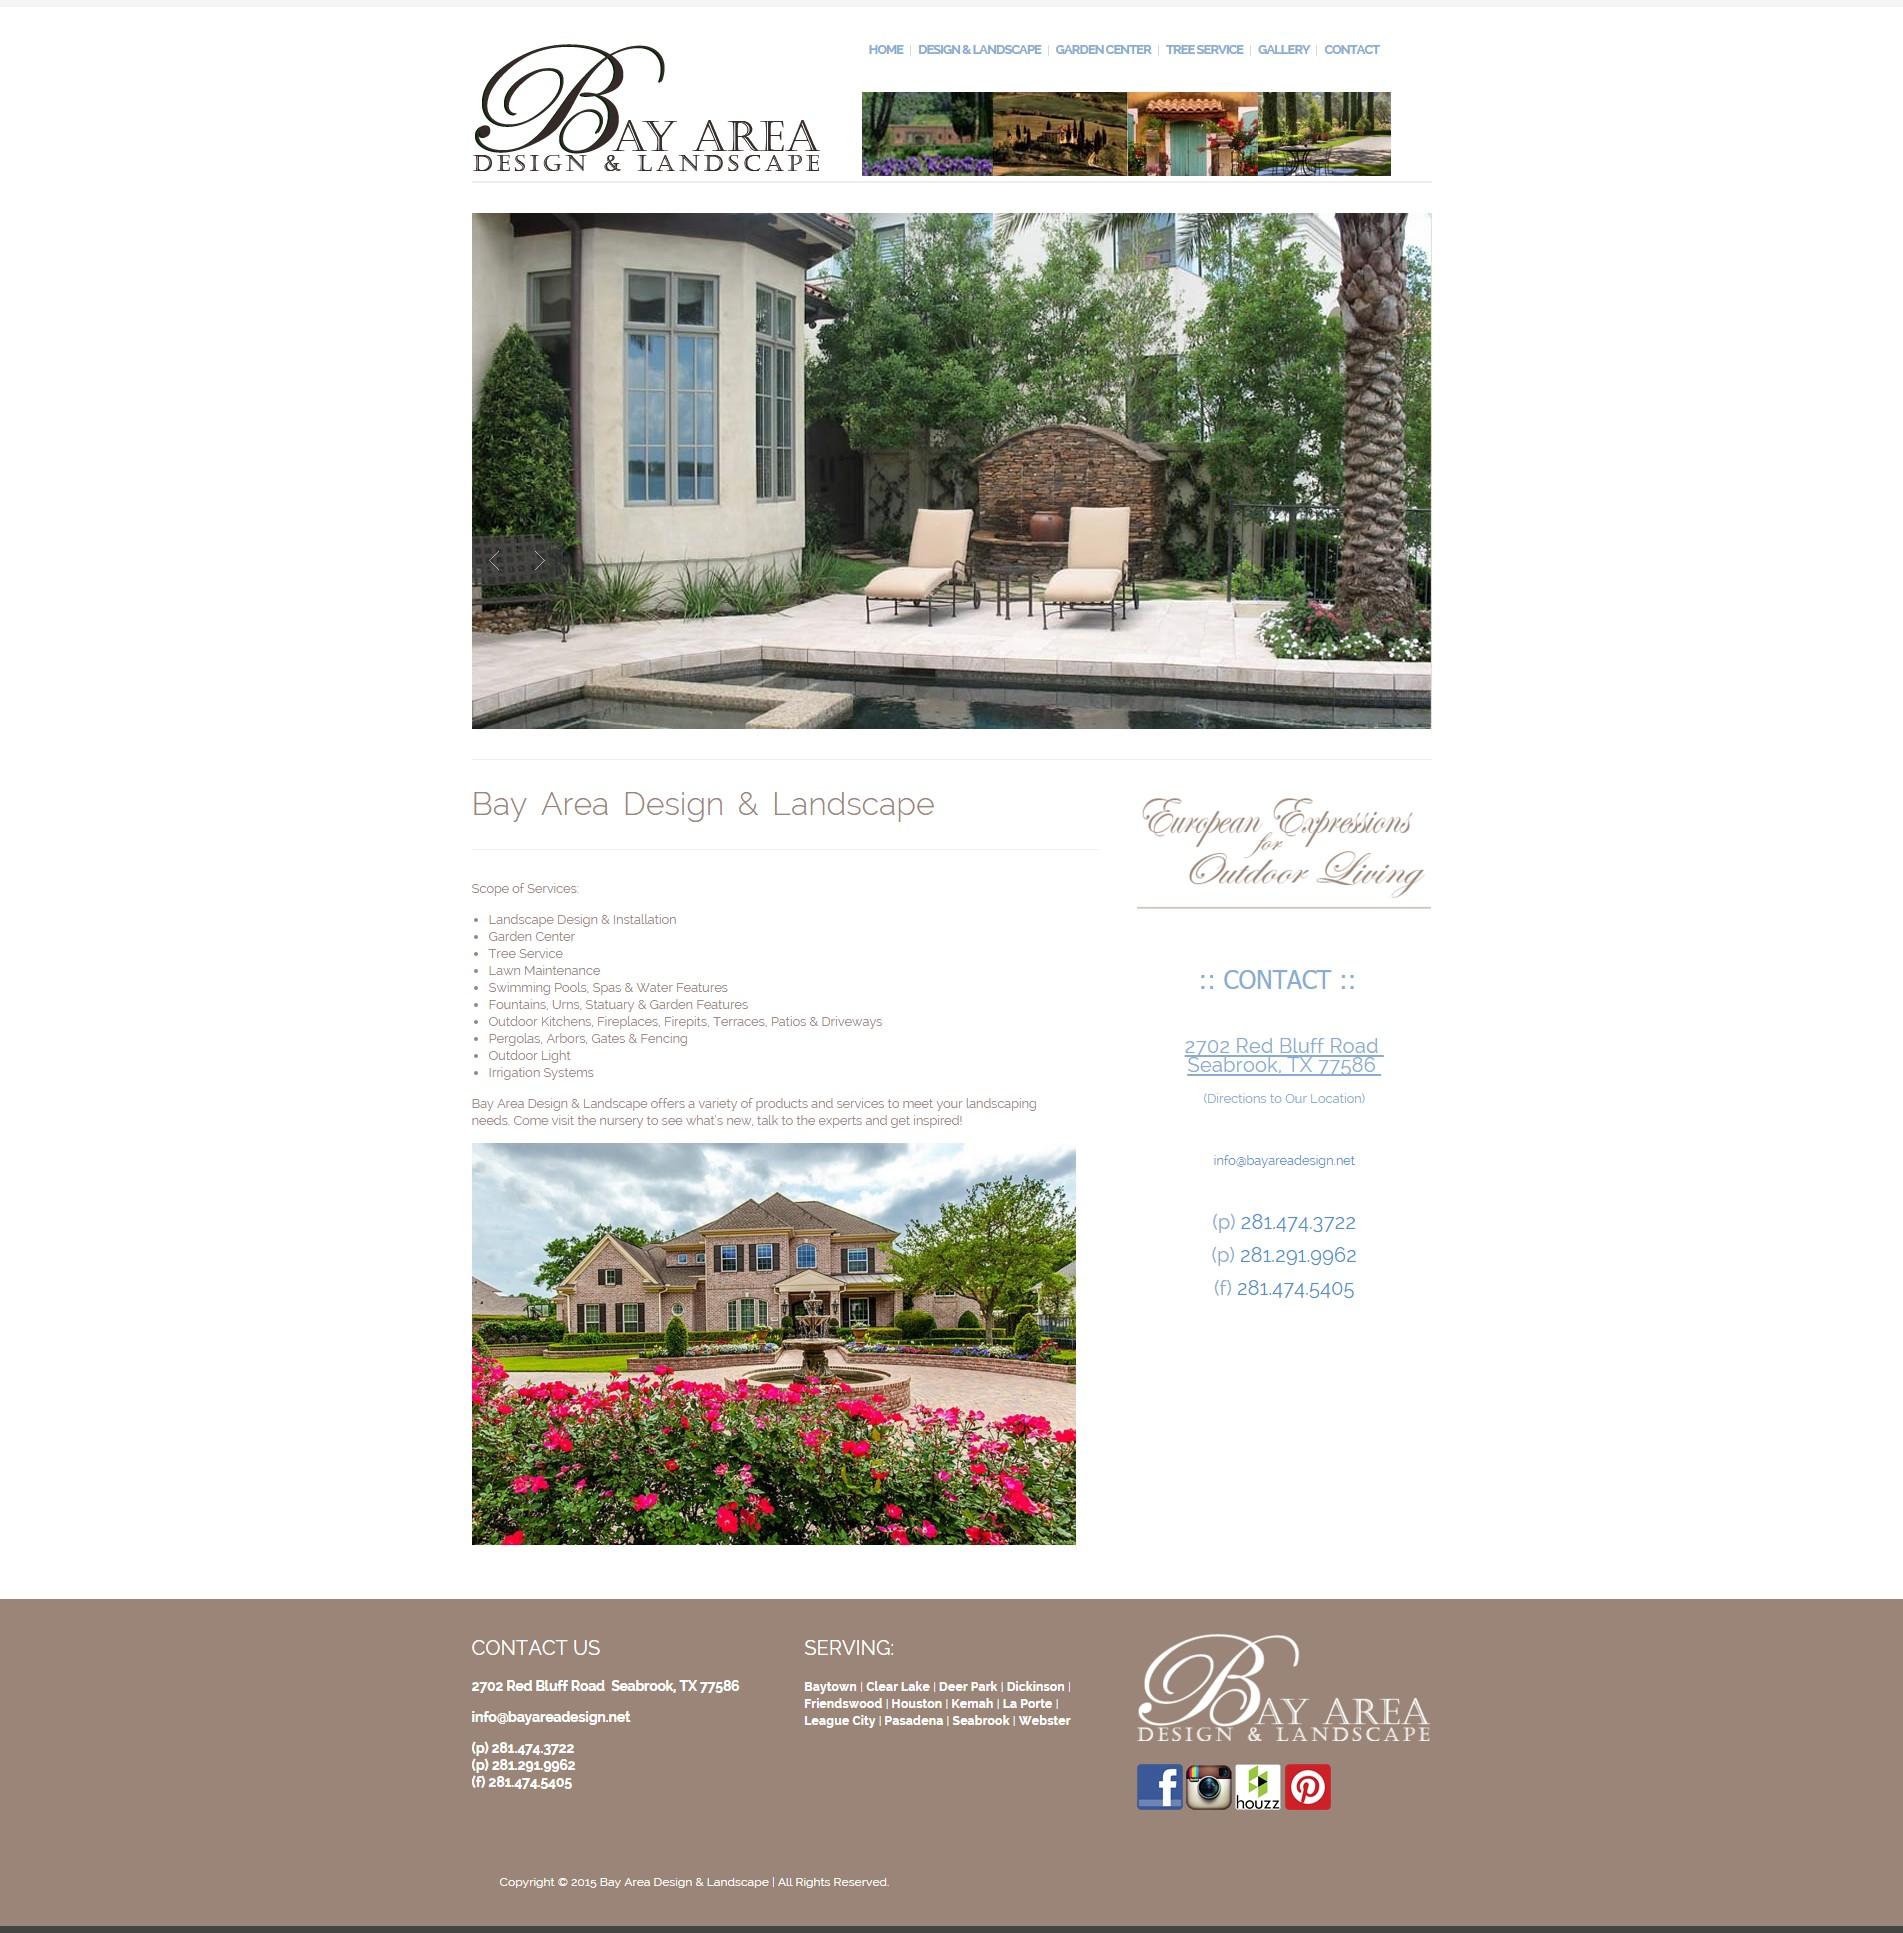 Bay area design and landscape seabrook beatiful landscape for Bay area landscape design